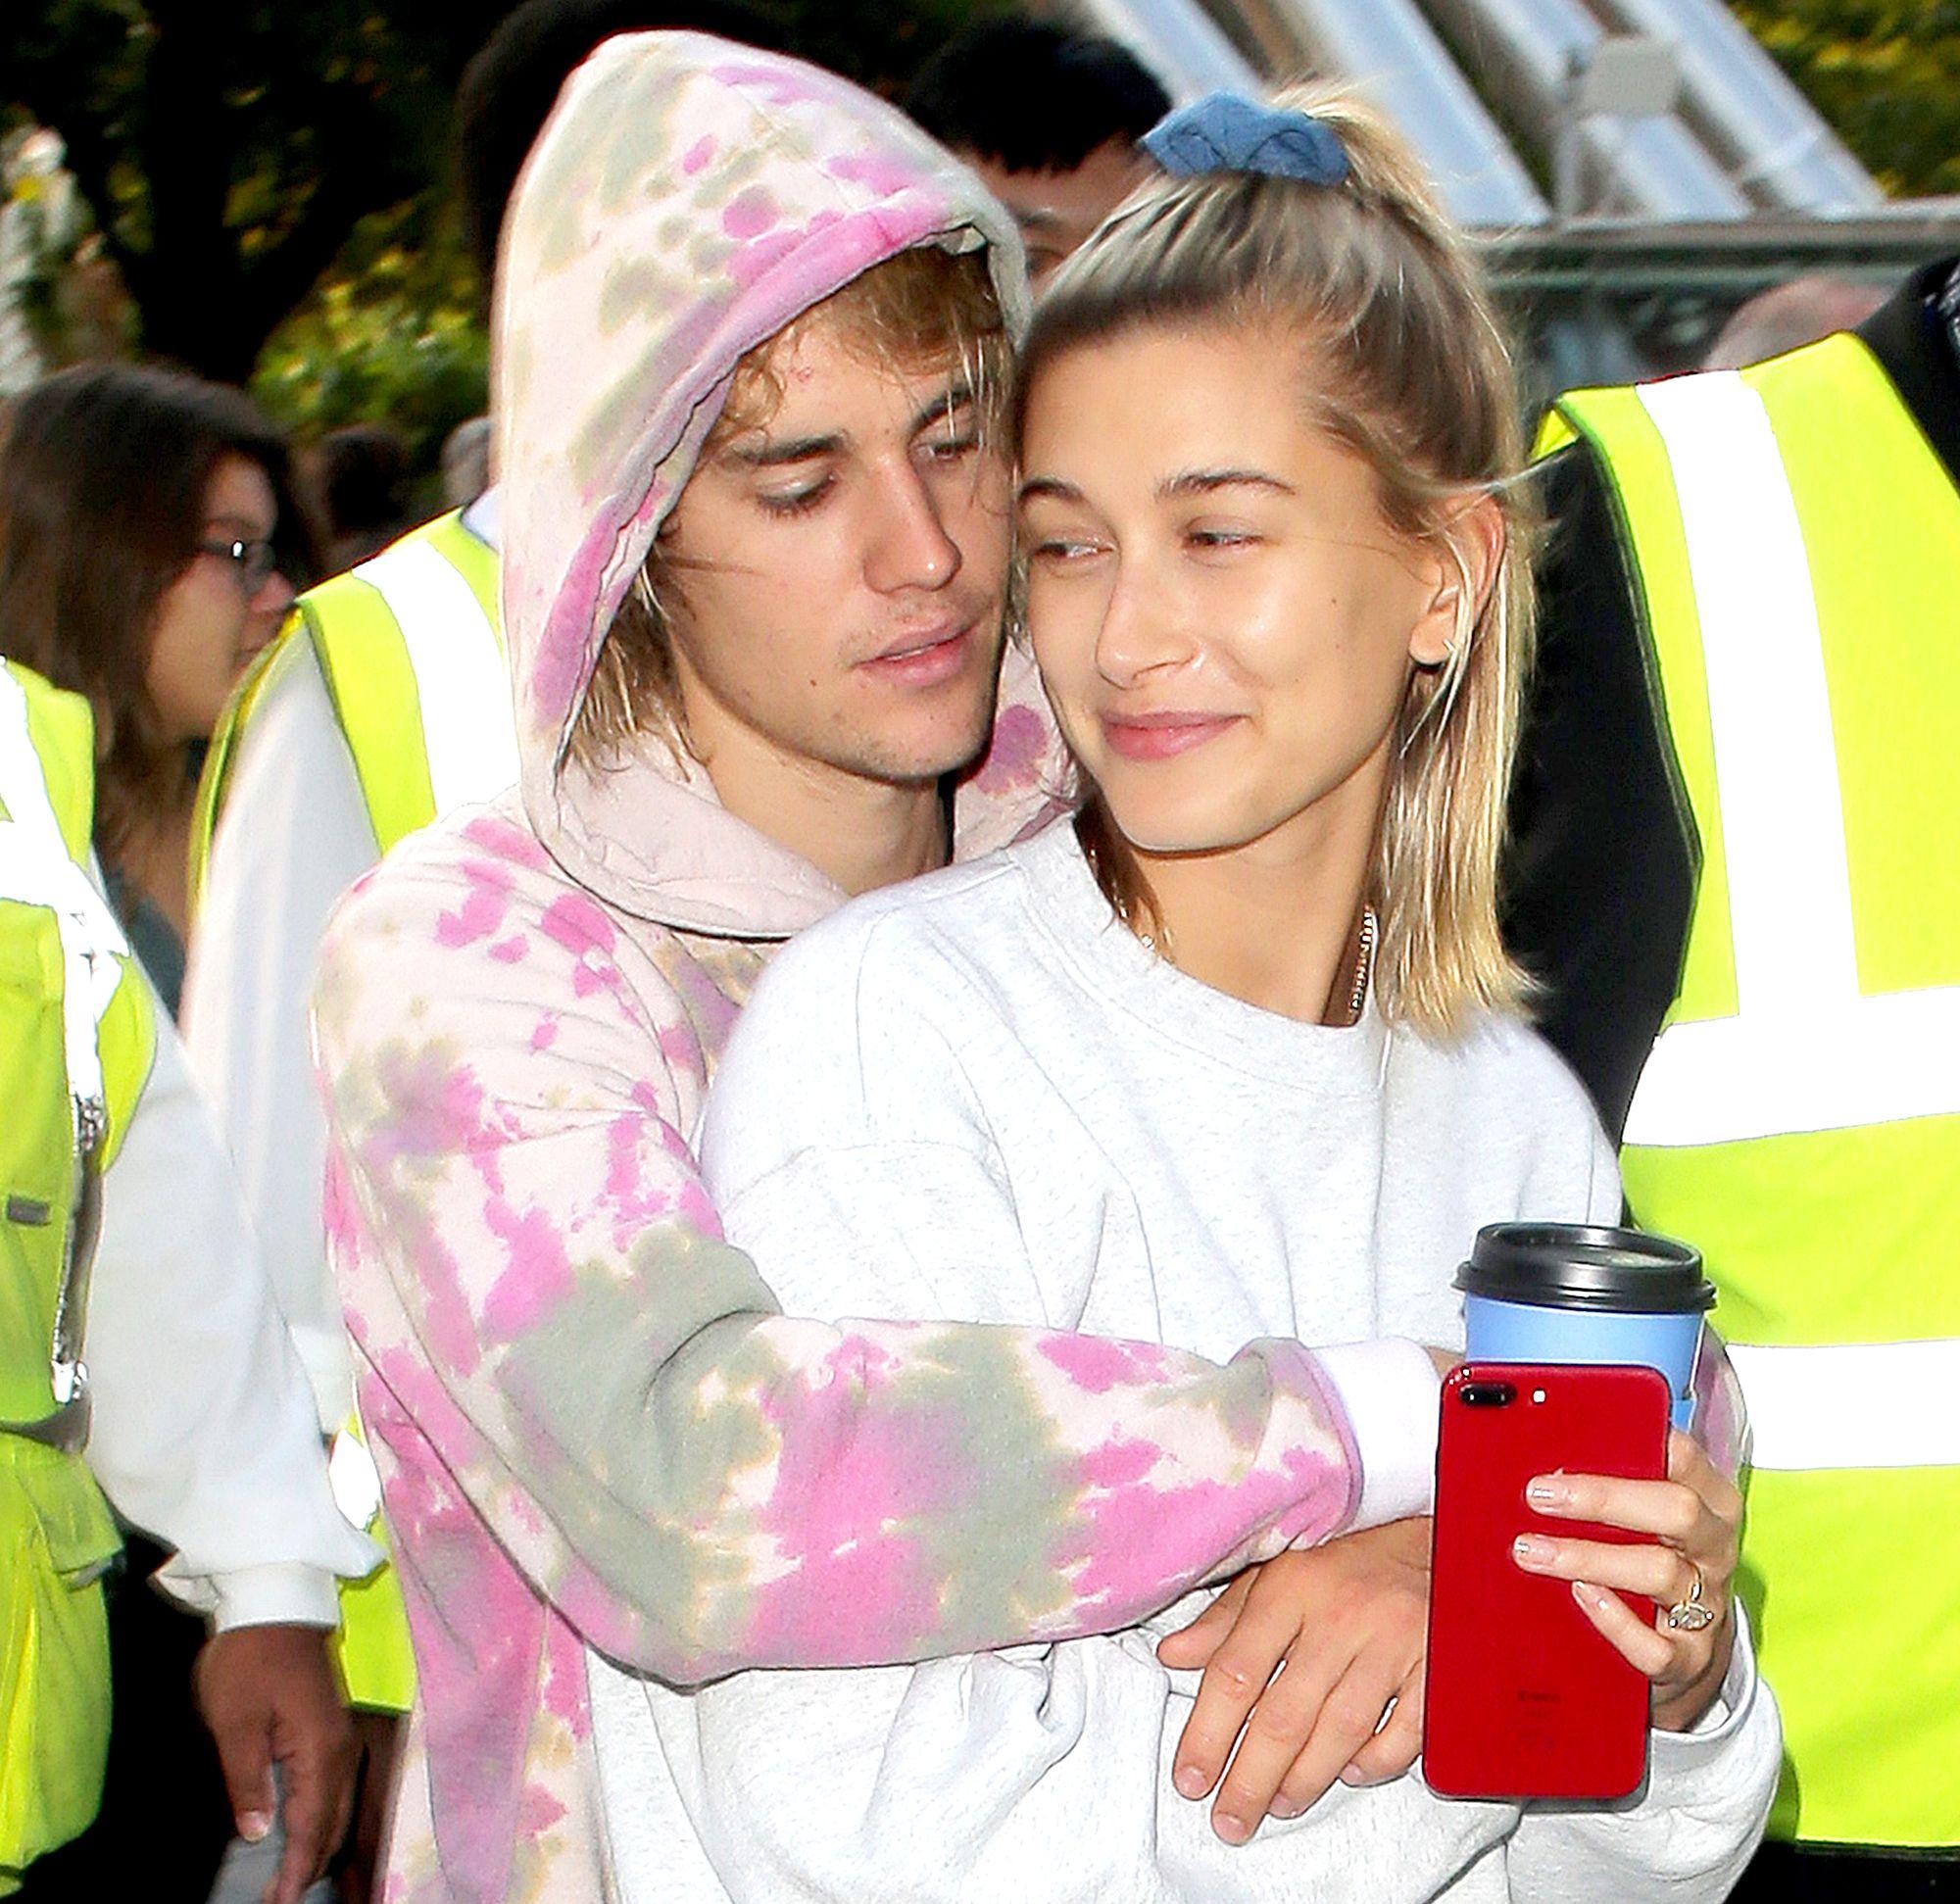 Kendall jenner és Justin bieber randevú 2015